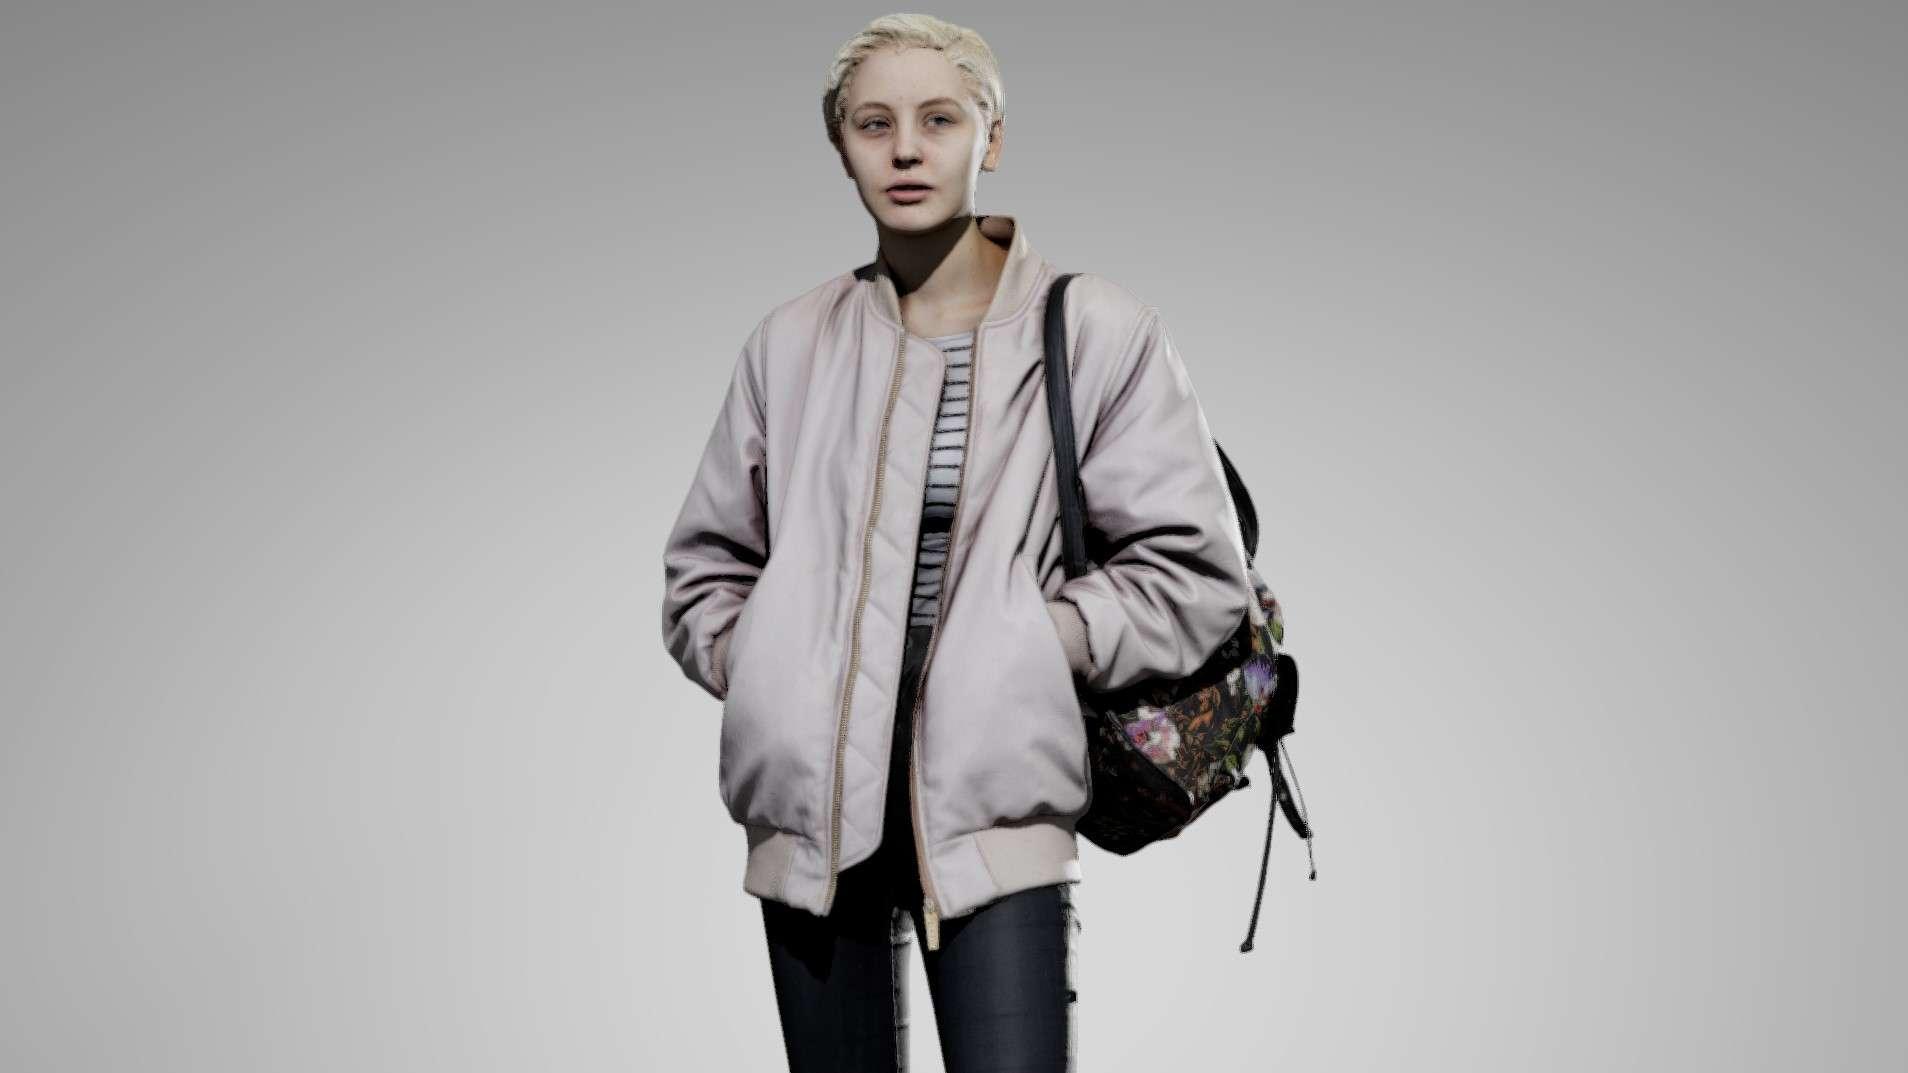 ANATOMY360 FEMALE CLOTHING PACK 01 - Model 3D